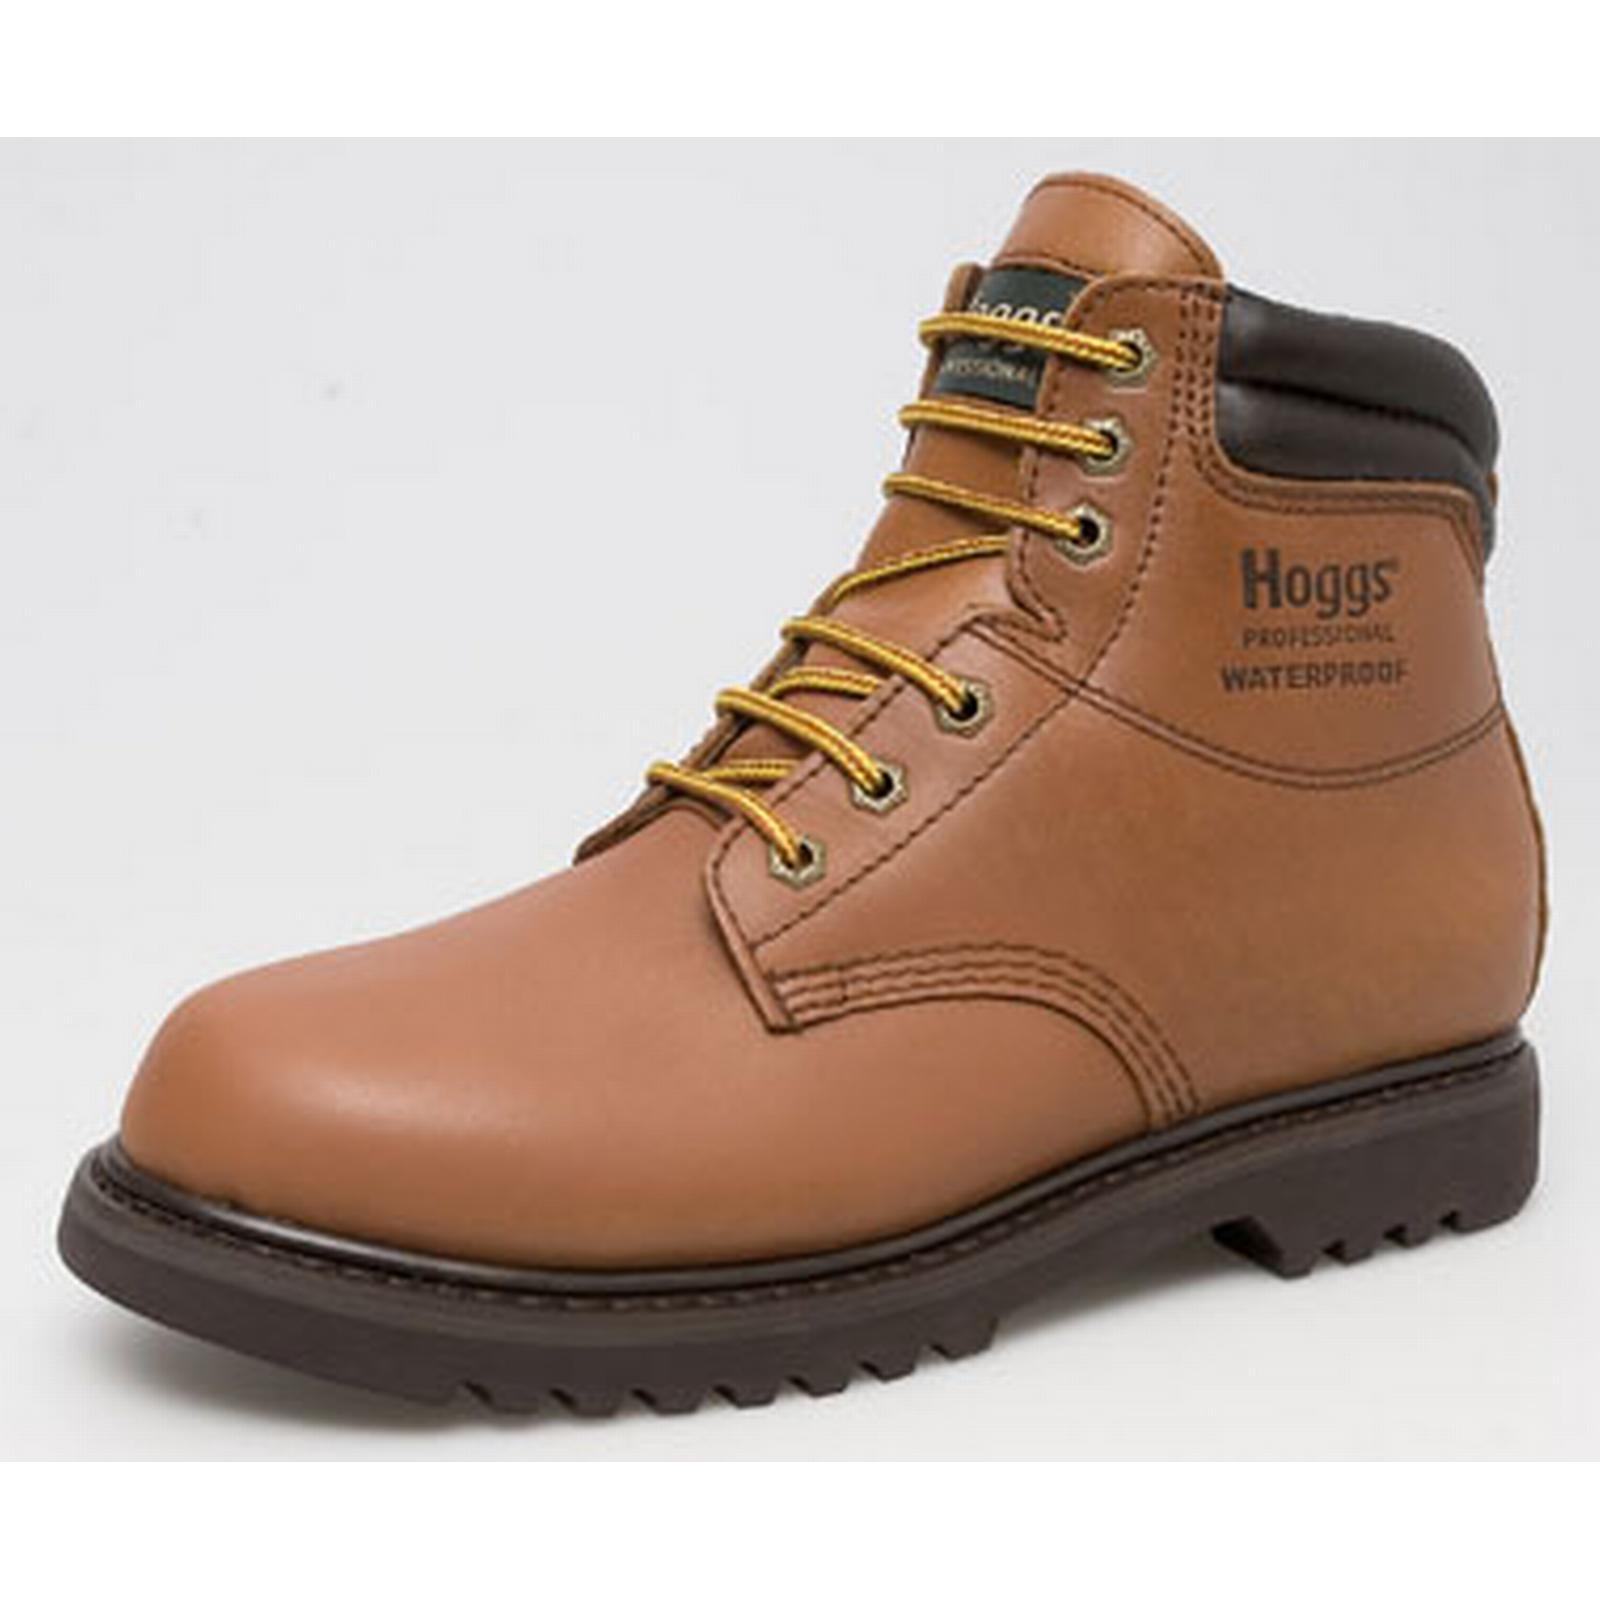 Hoggs Golden Mens Wateproof Boots Atlas Golden Hoggs Tan 6 f8ab59